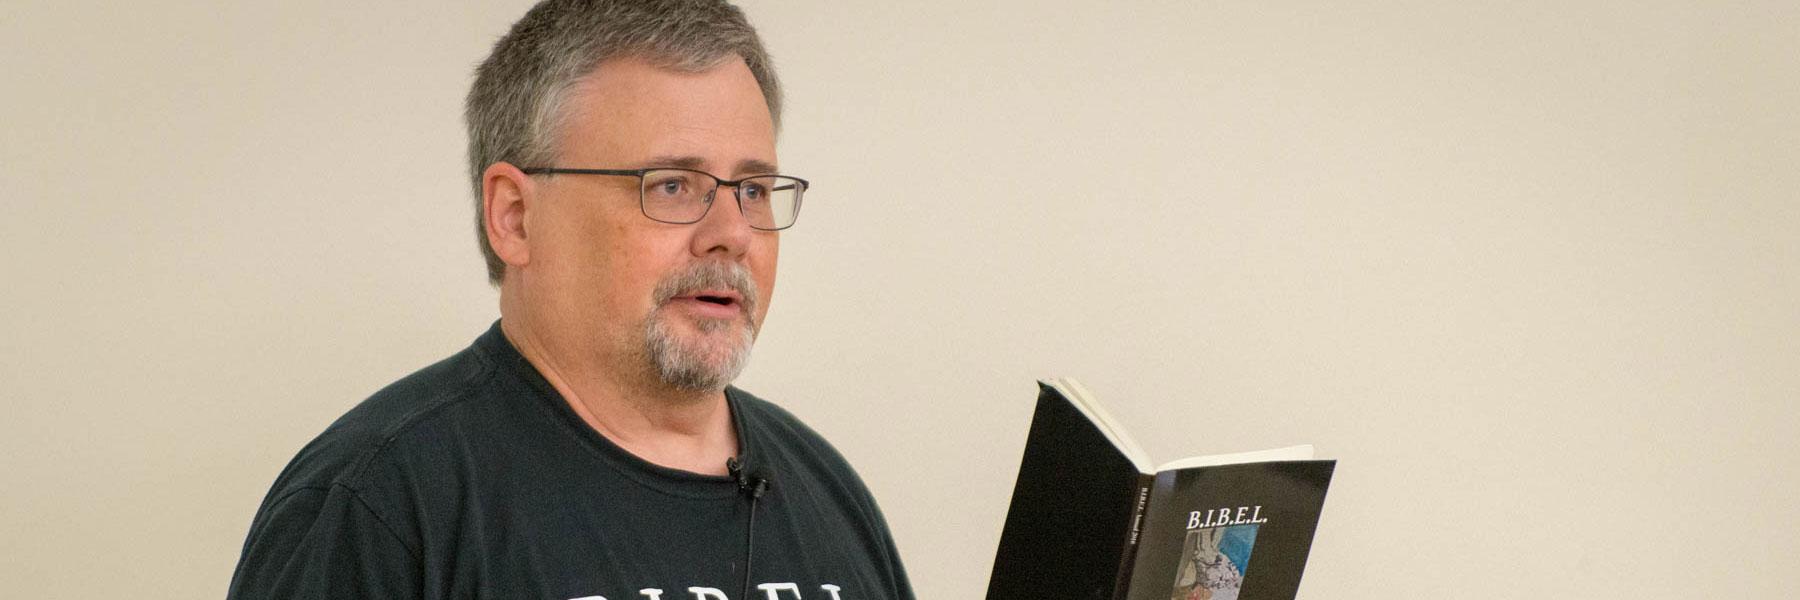 Rev. Dr. Thomas Rank, Religious Studies department professor